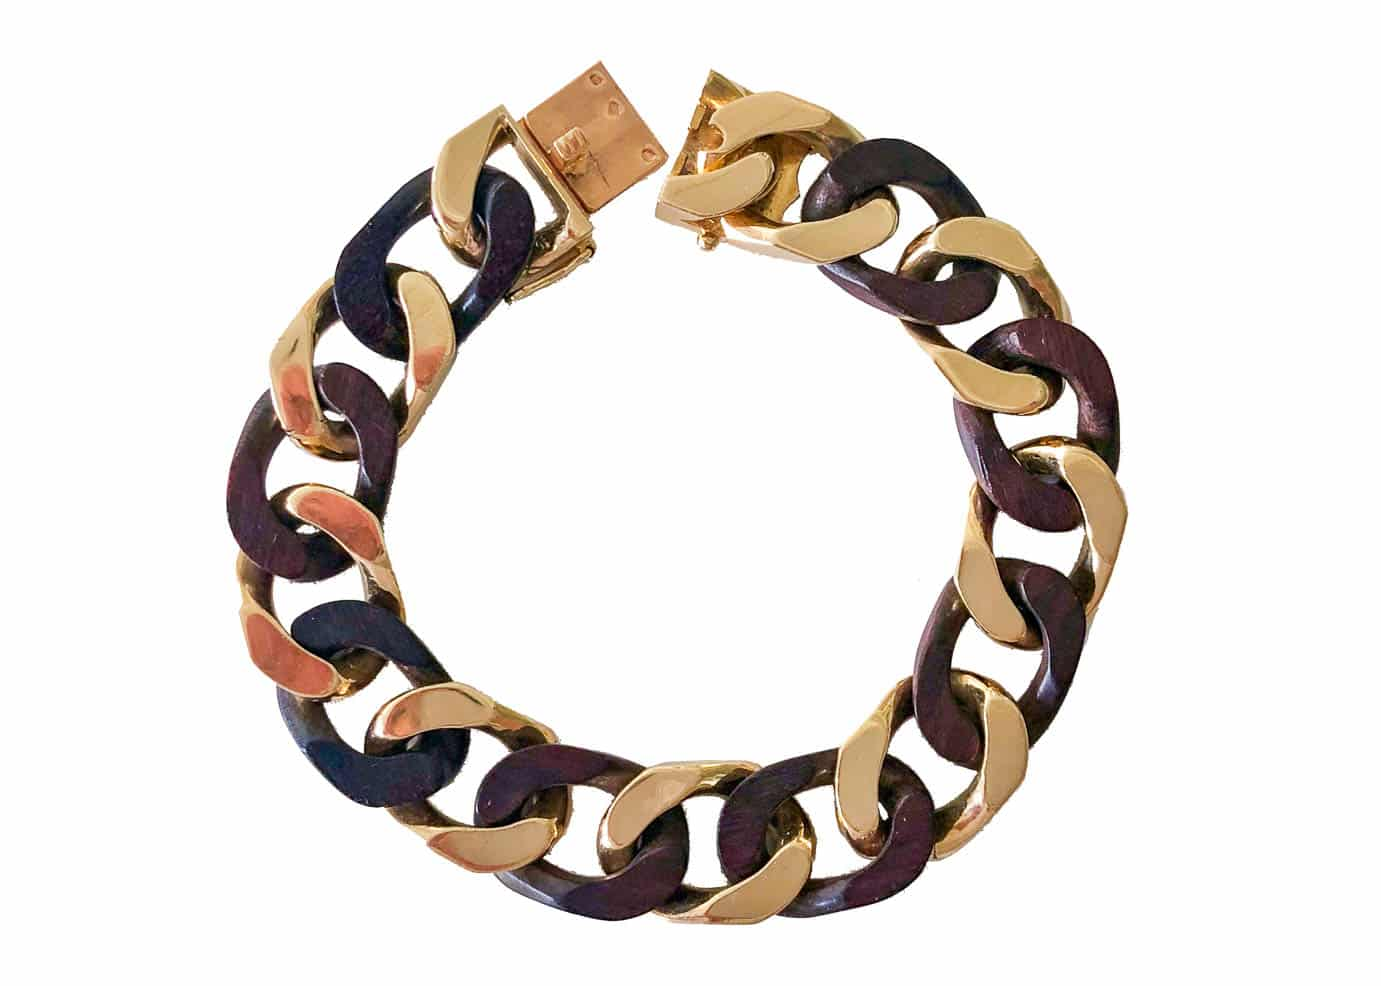 van cleef and arpels wood and gold bracelet